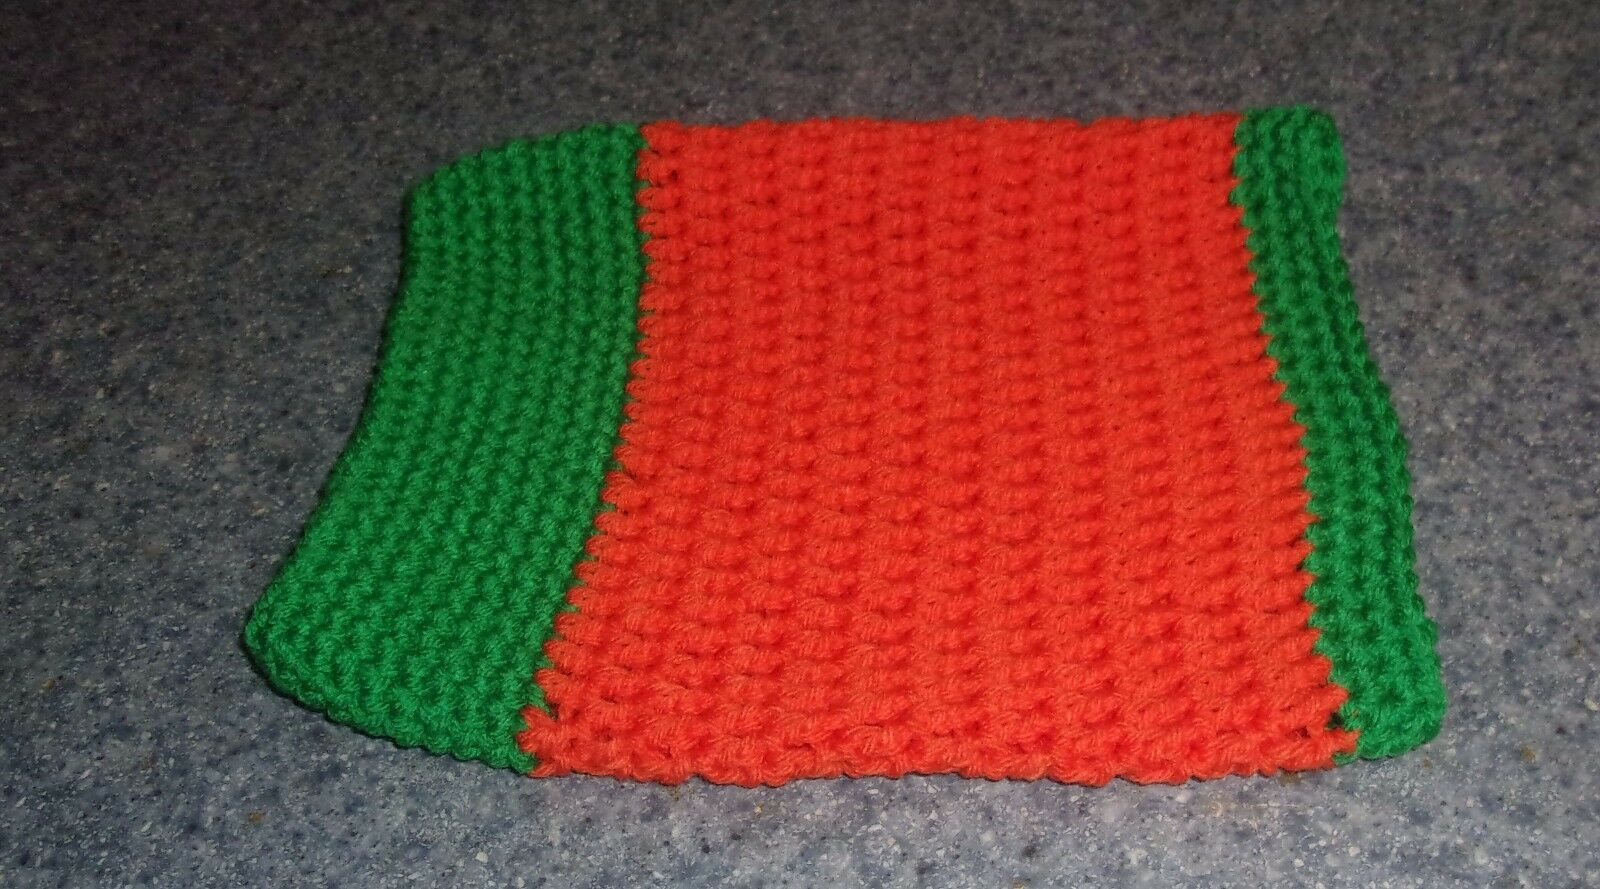 Brand New Hand Crocheted Orange Green Dog Snood Neck Warmer 4 Dog Rescue Charity